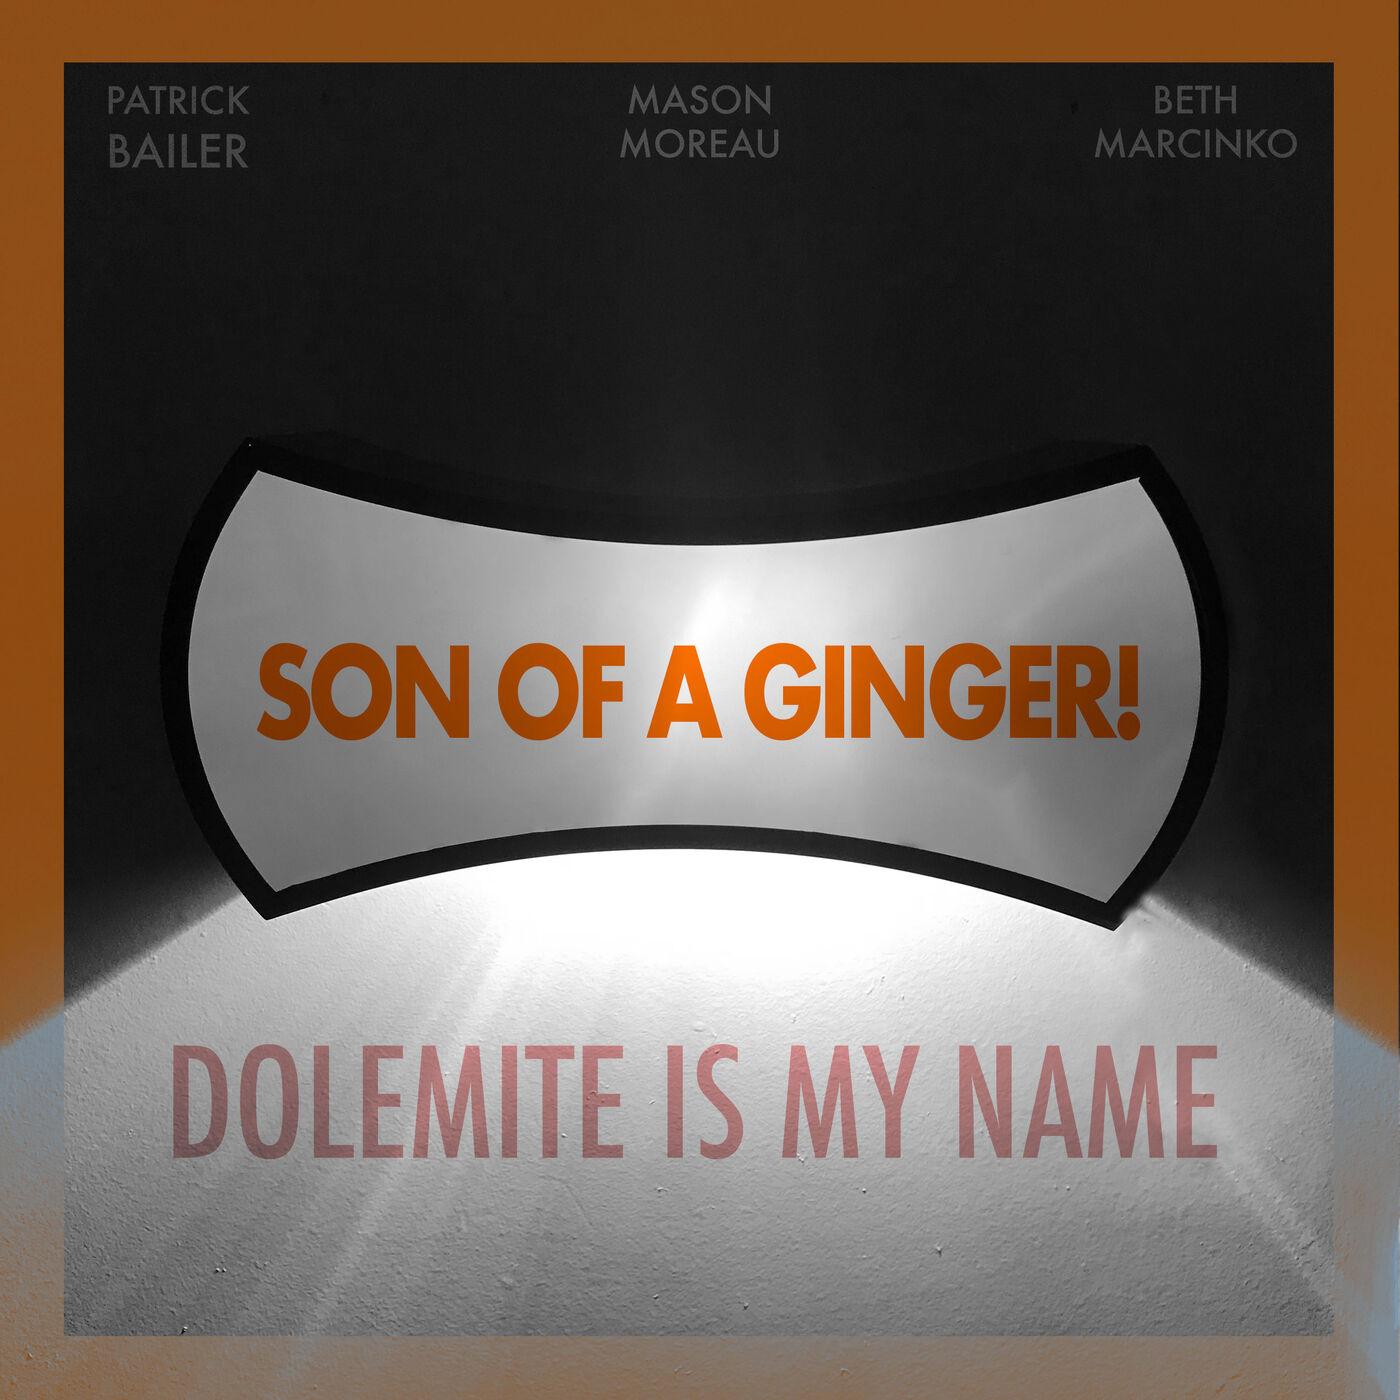 Dolemite Is My Name (Dir. by Craig Brewer)